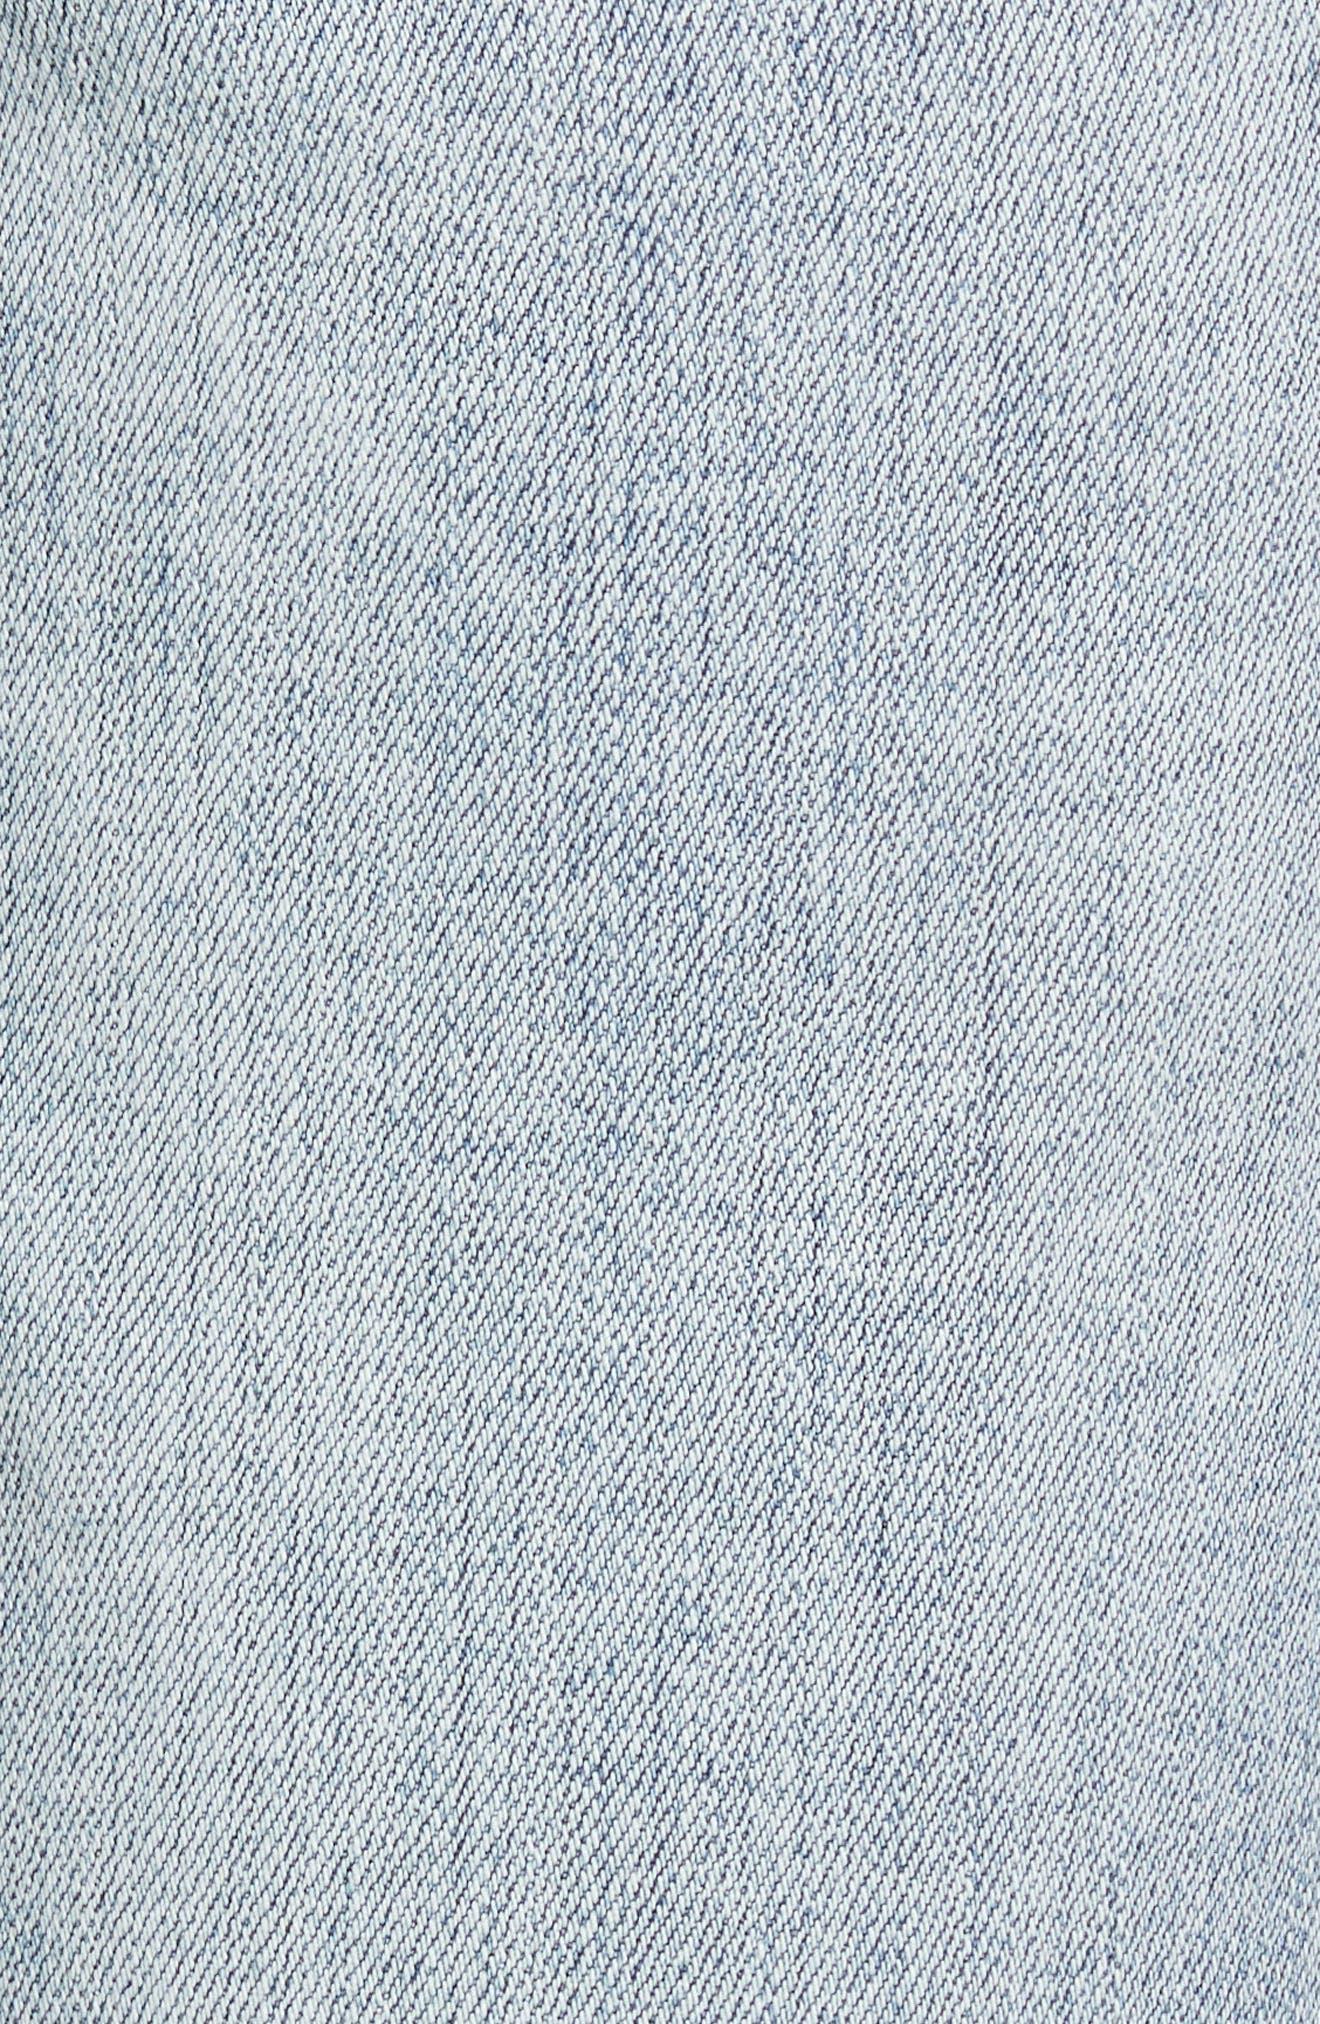 Baby Bootcut Contrast Release Hem Jeans,                             Alternate thumbnail 5, color,                             464